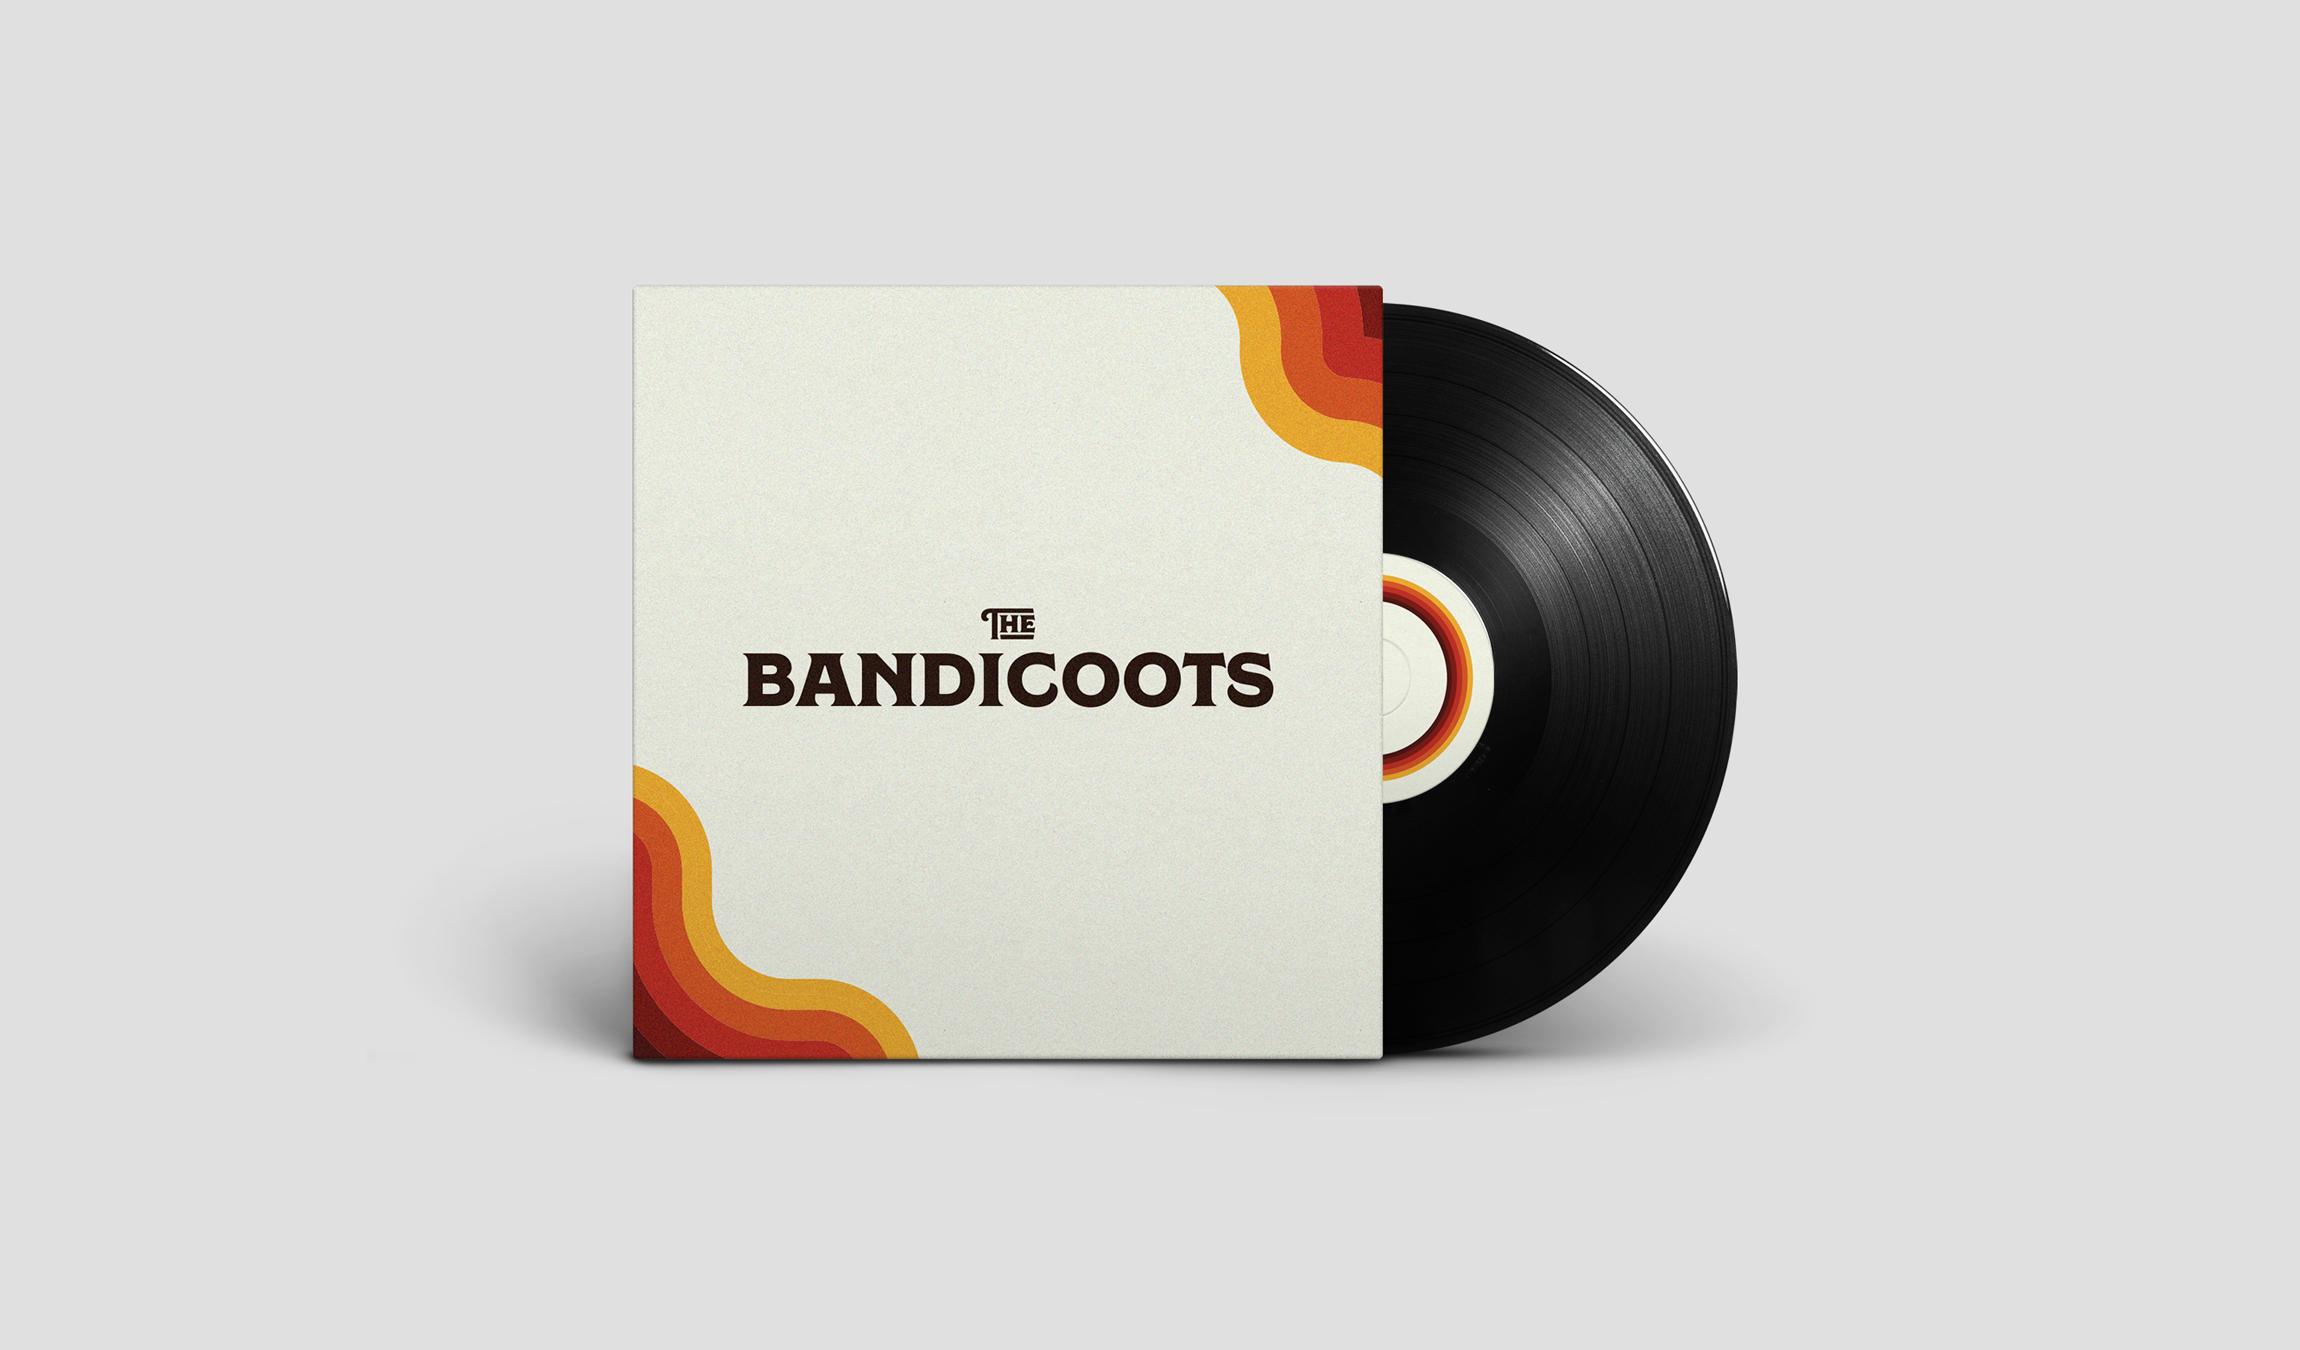 Bandicoots02.png